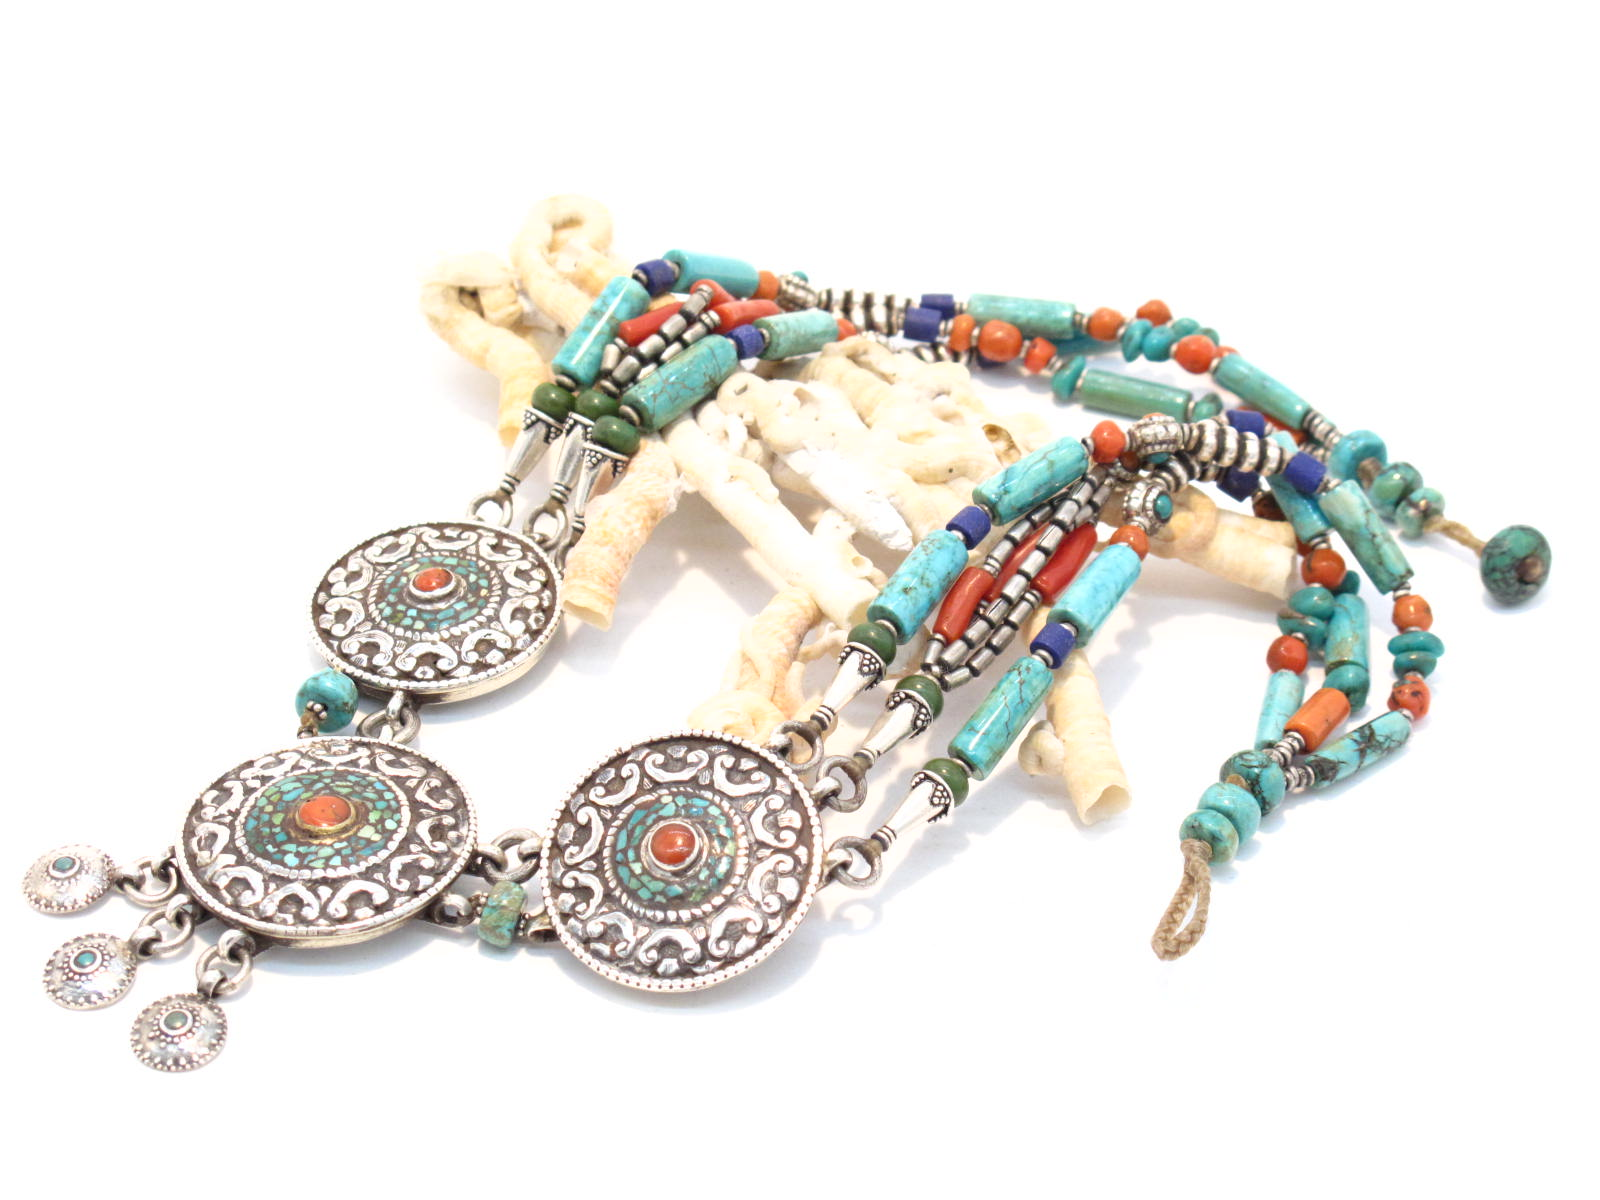 collana tibetana in argento turchese corallo lapislazzzuli